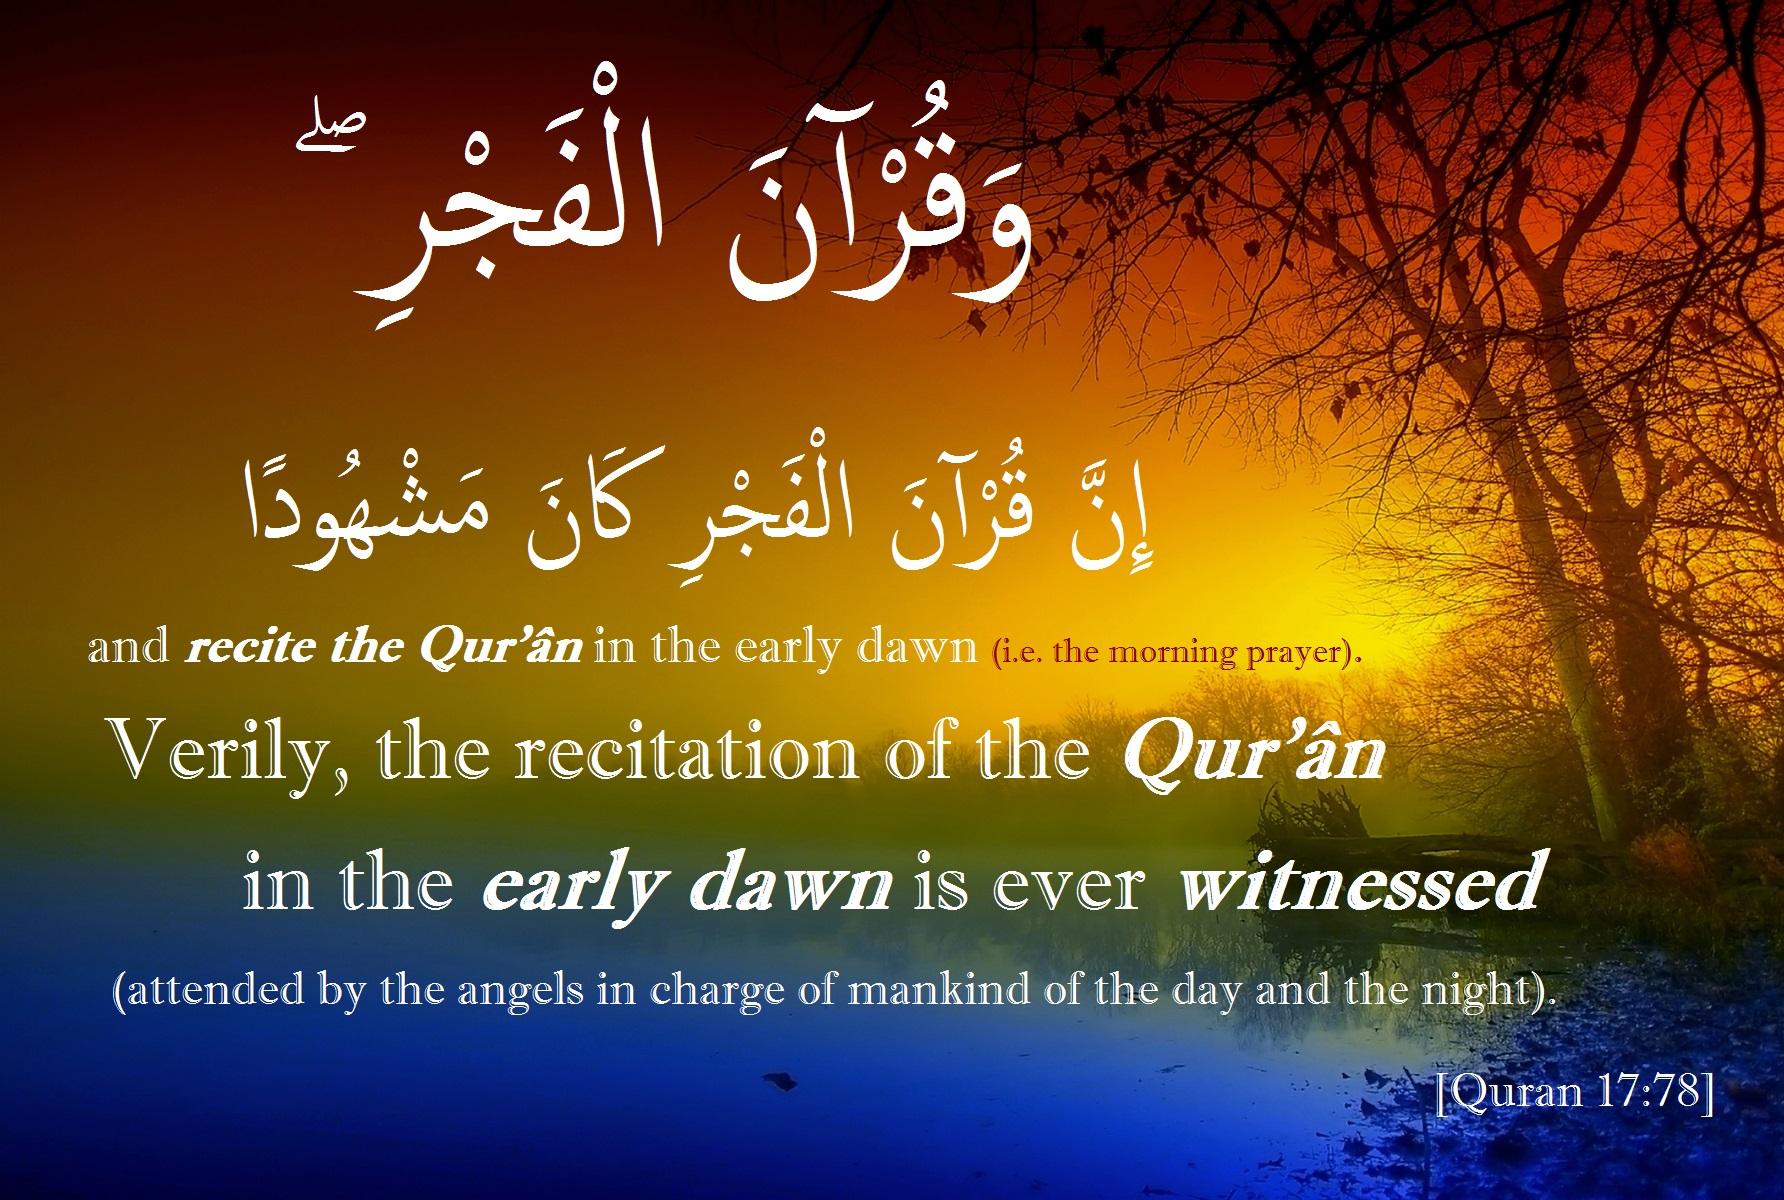 dawn quran recitation witnessed